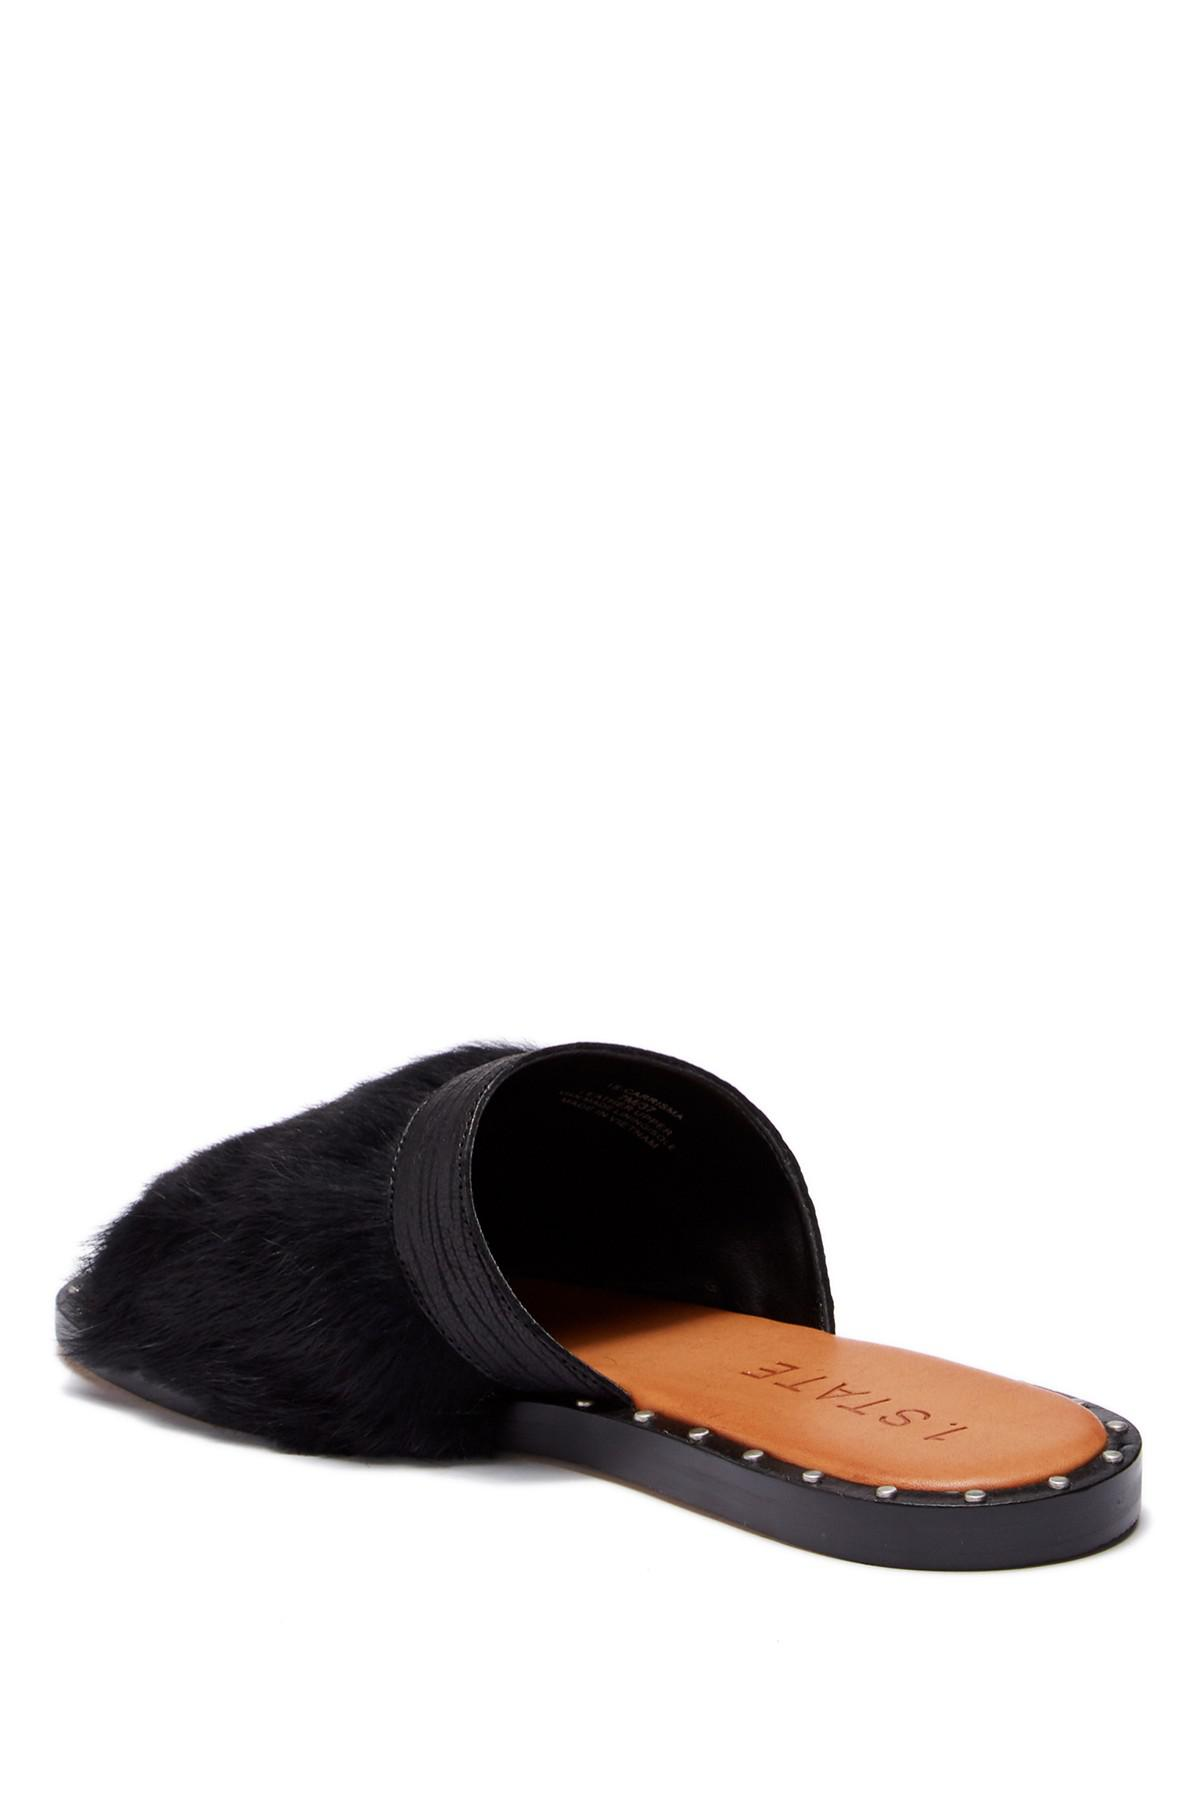 1.State Carrisma Leather & Rabbit Fur Slide Sandal